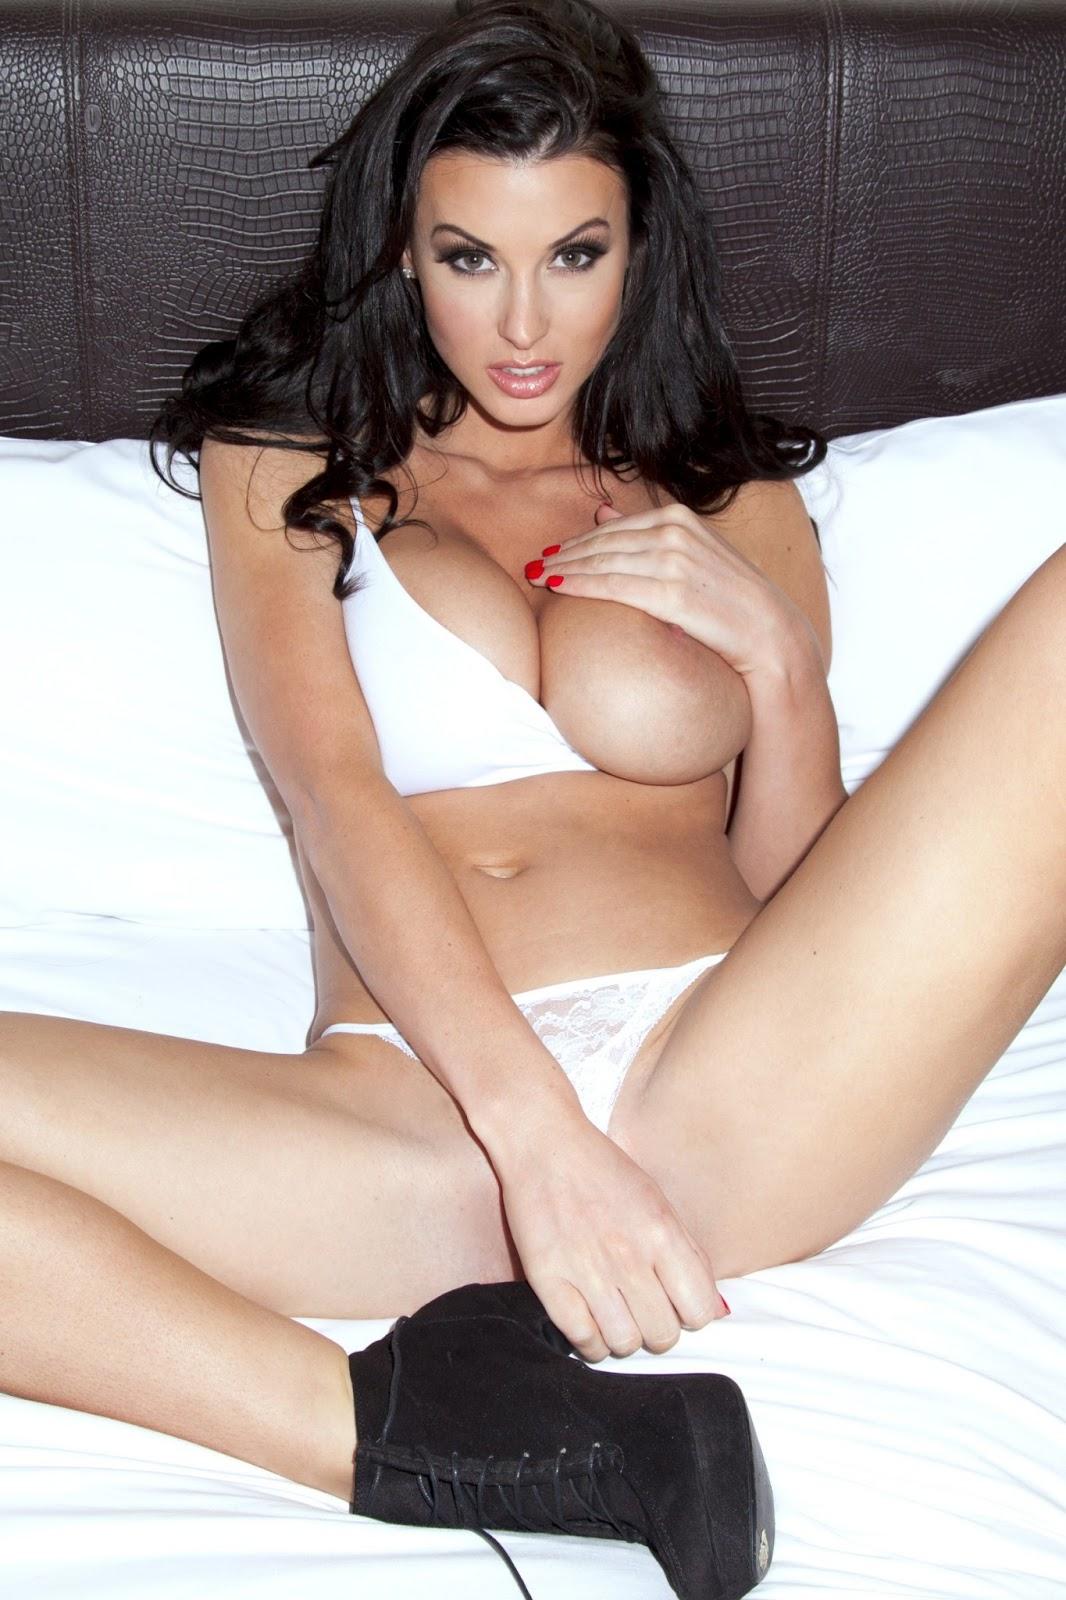 Cute nude nn models pics